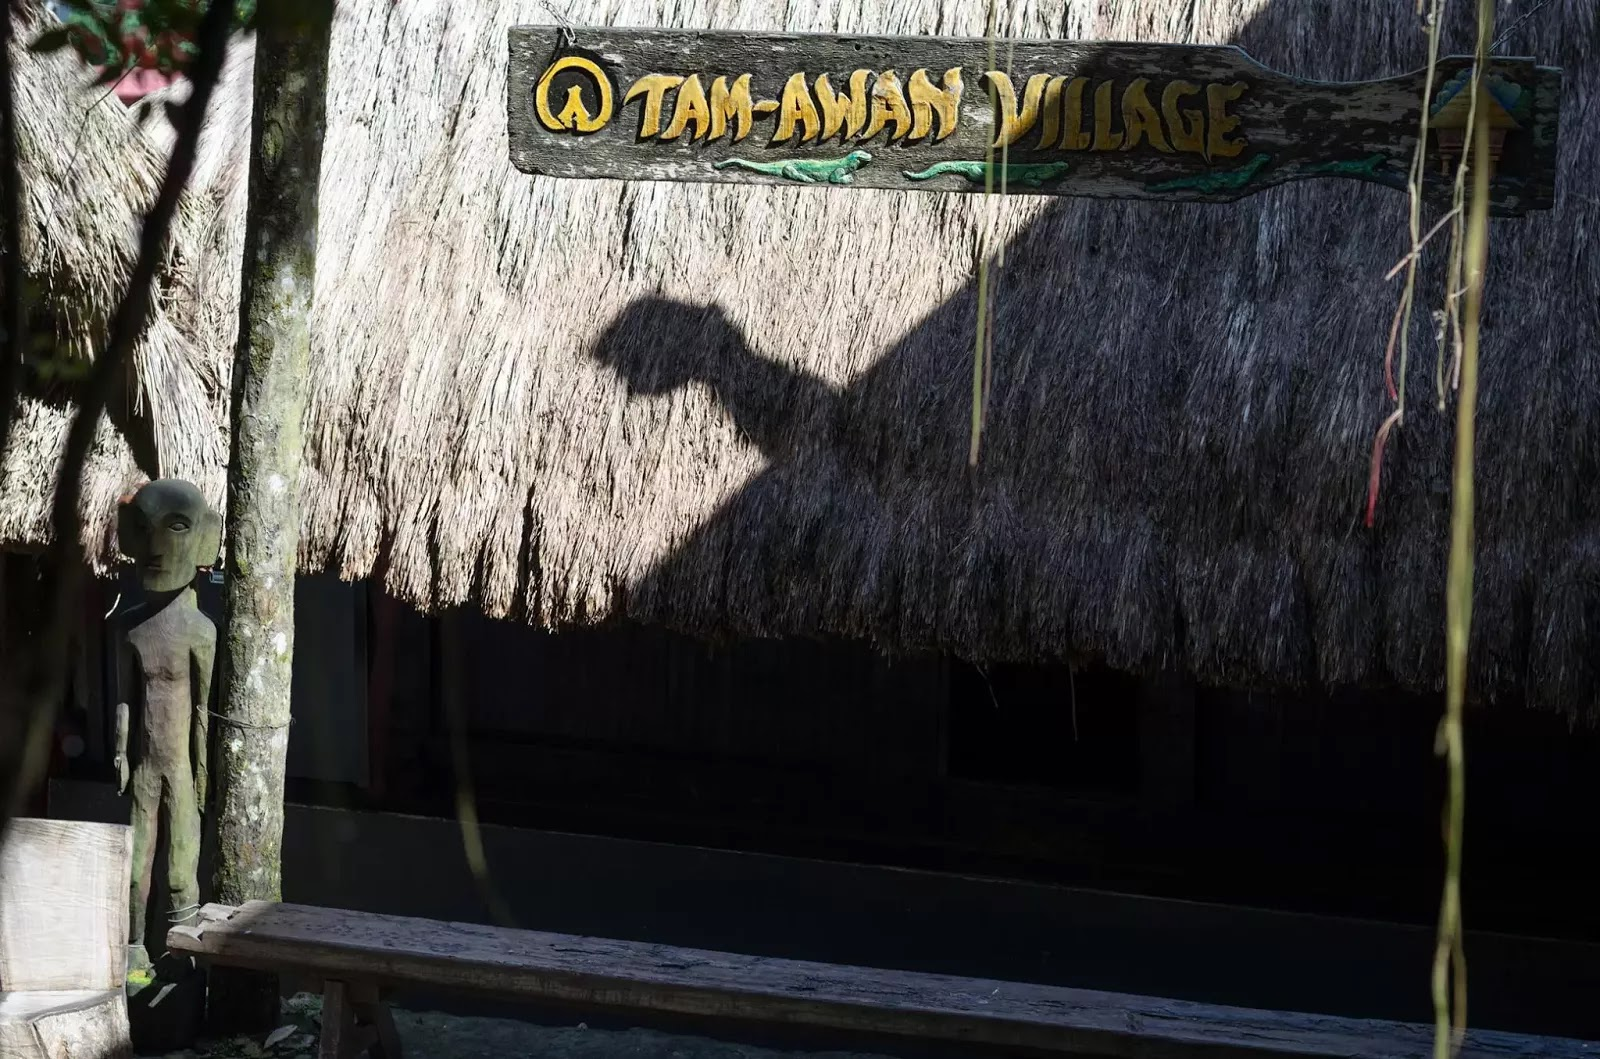 International Arts Festival 8th Tam-awan Baguio City Philippines Fertility Idol Guardian